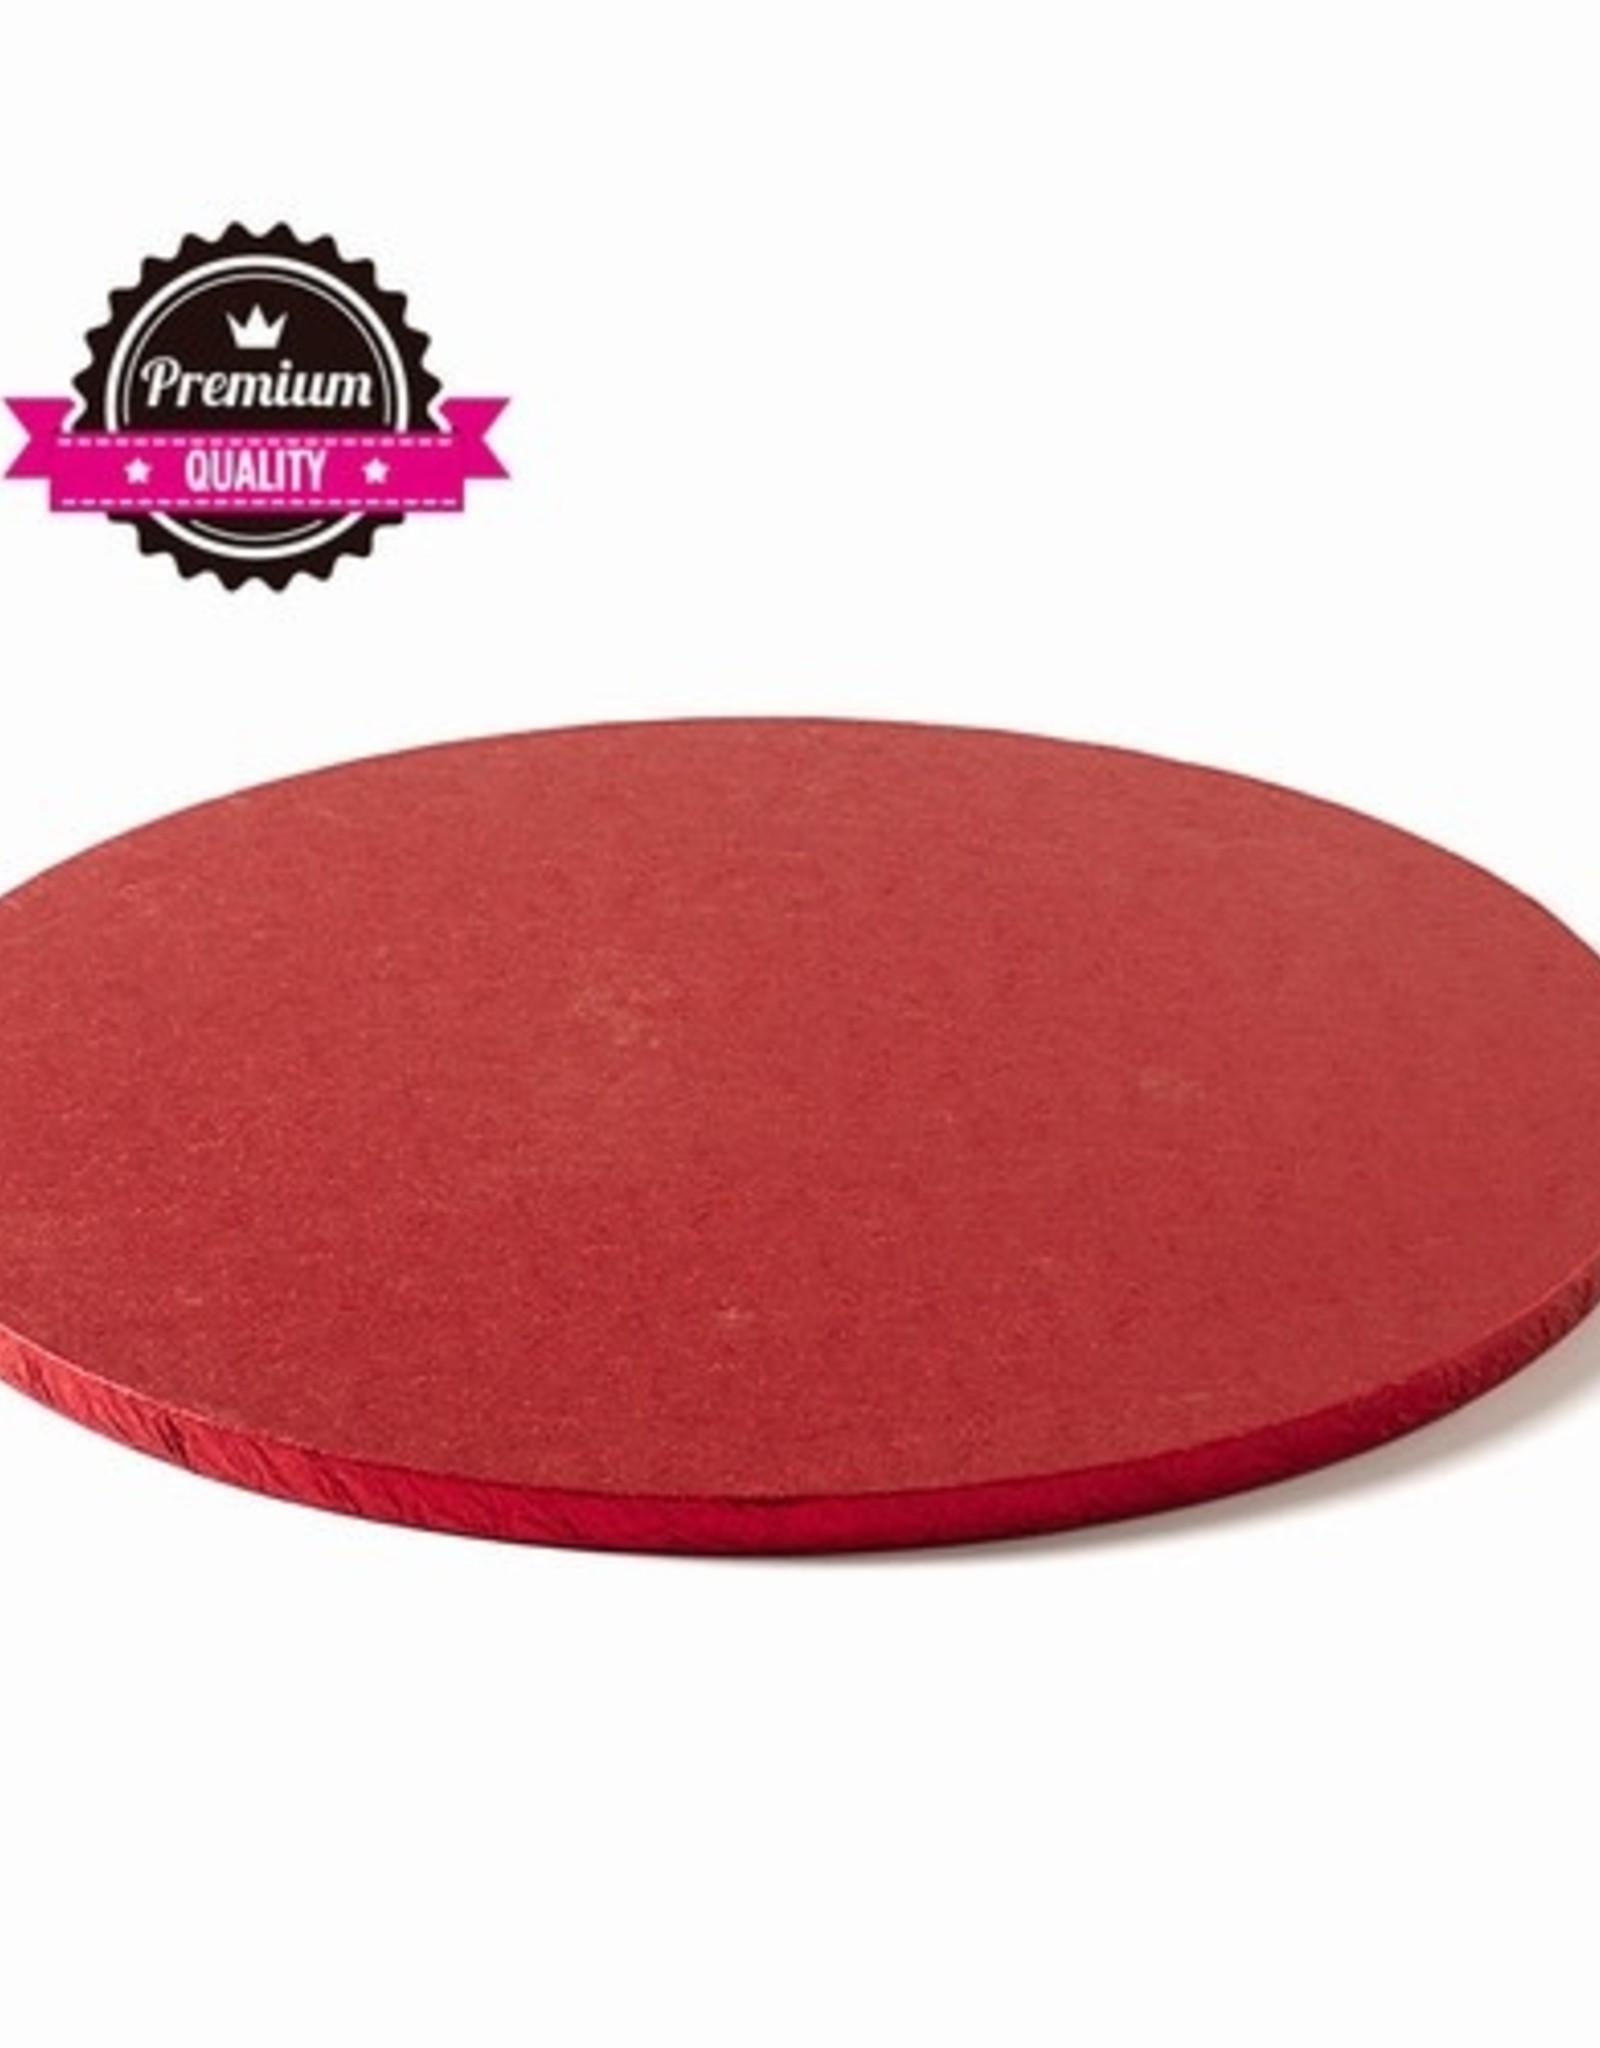 Decora Cake Drum Rond Ø40cm Red